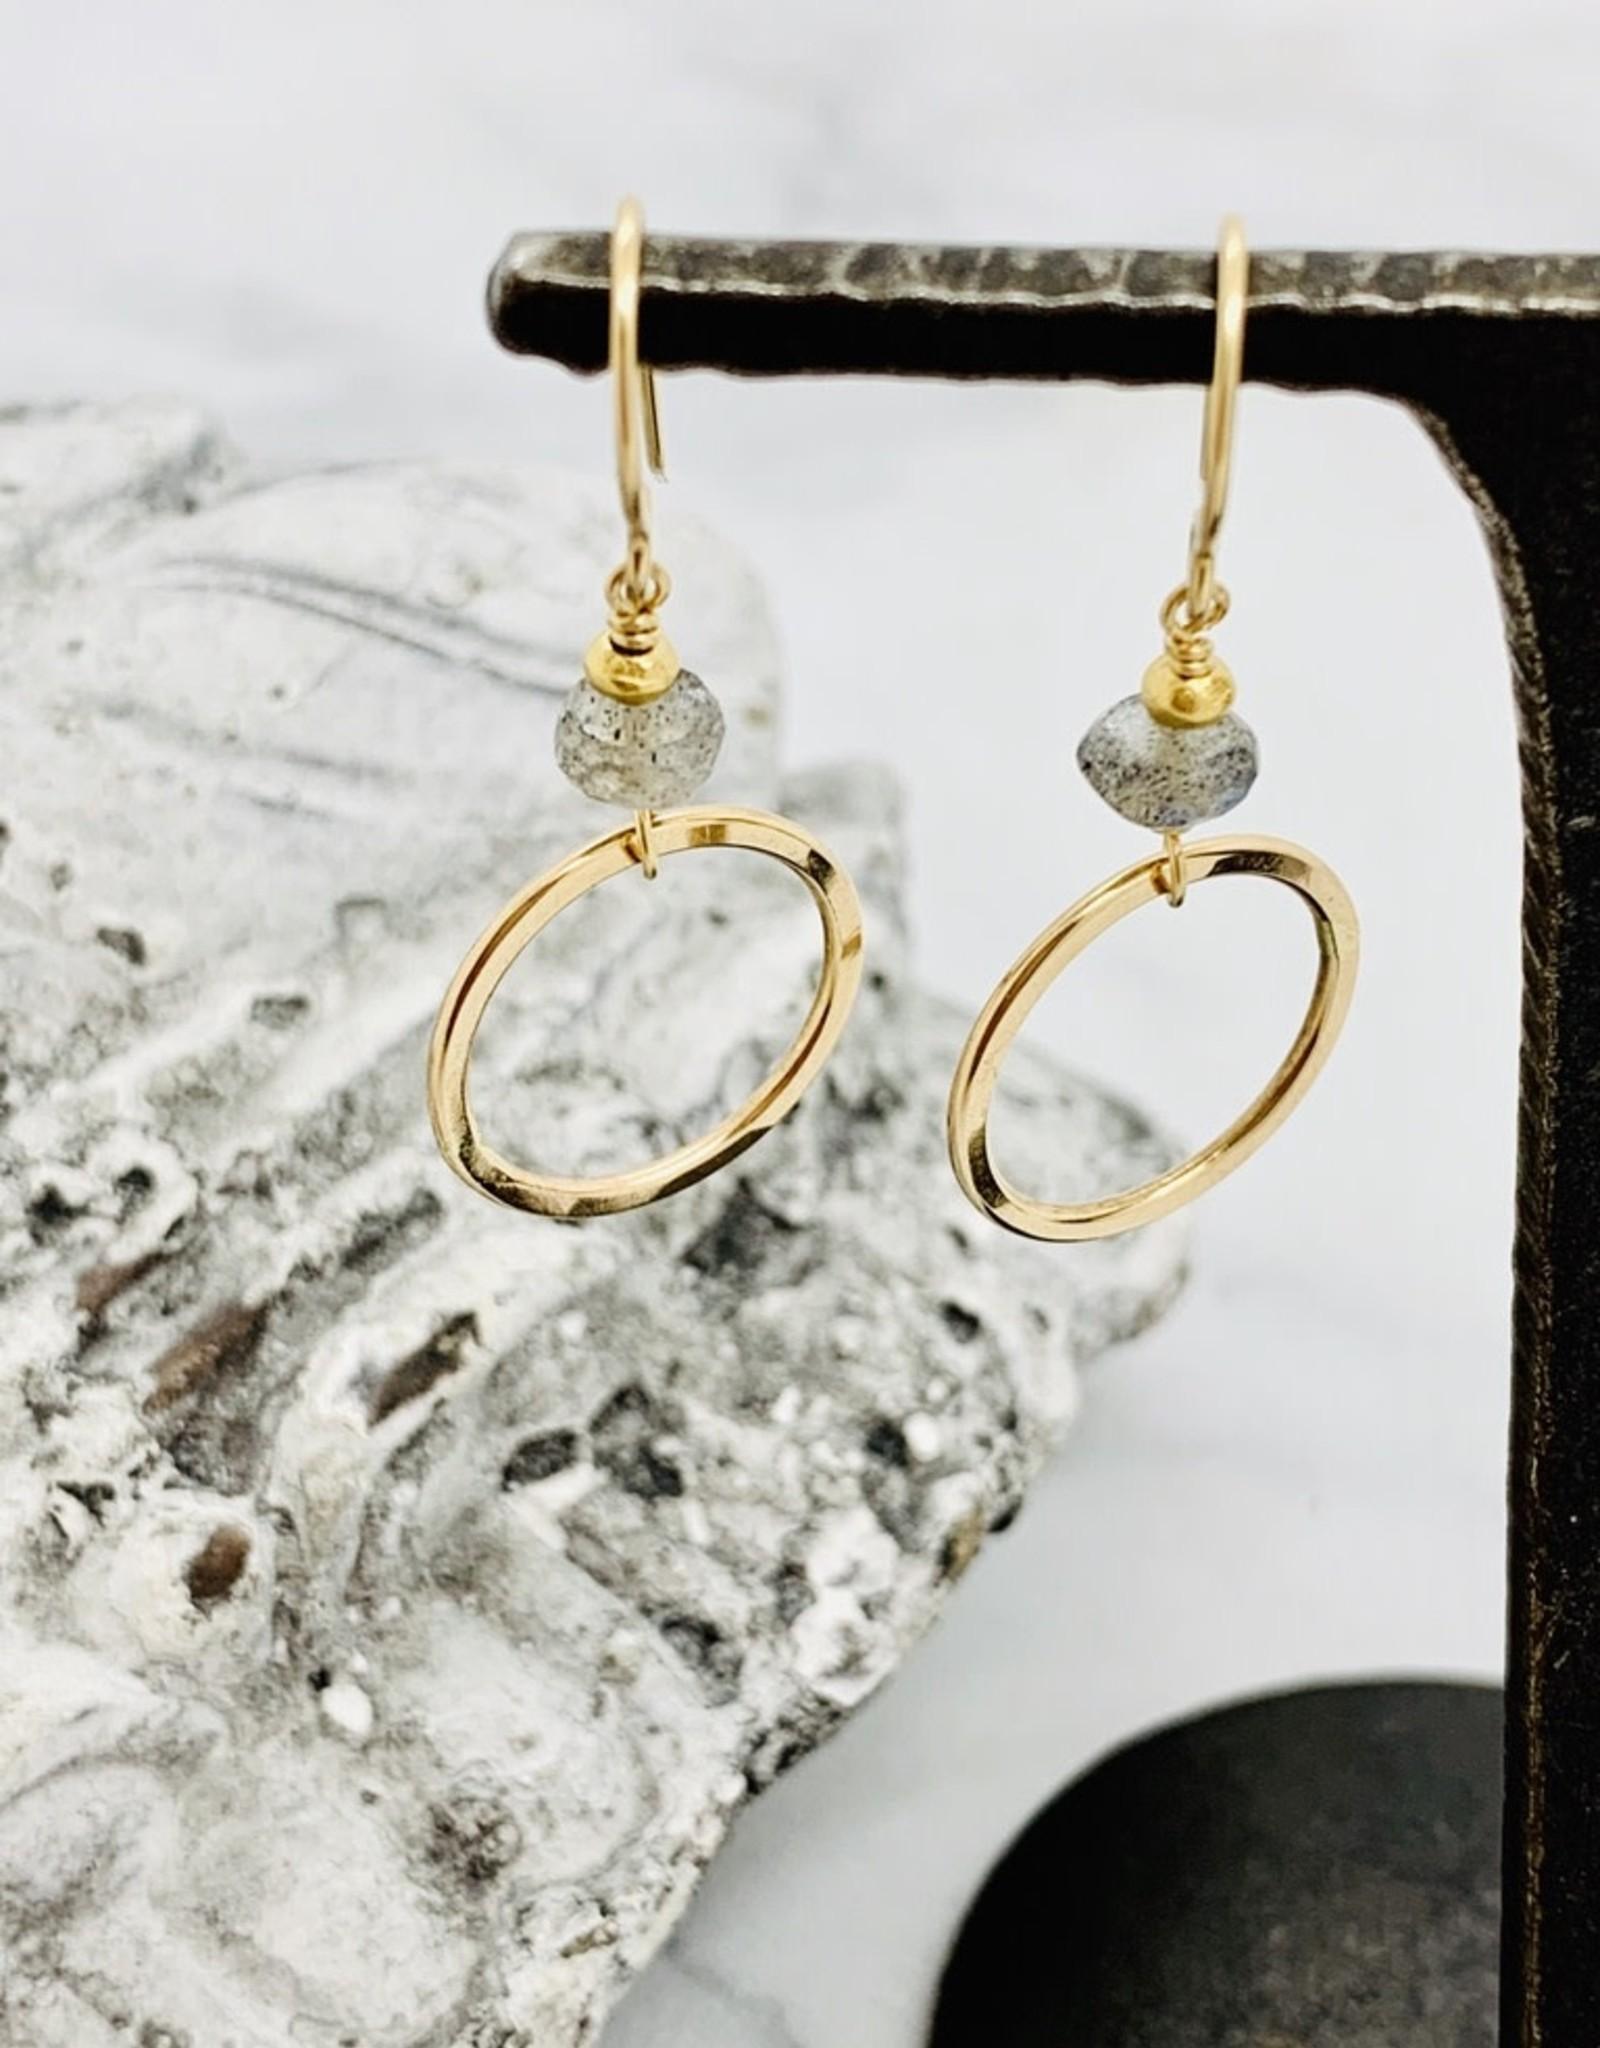 J&I Handmade Earrings with 6mm Faceted Labradorite and 14k Gold Filled Hoop Dangle Earrings